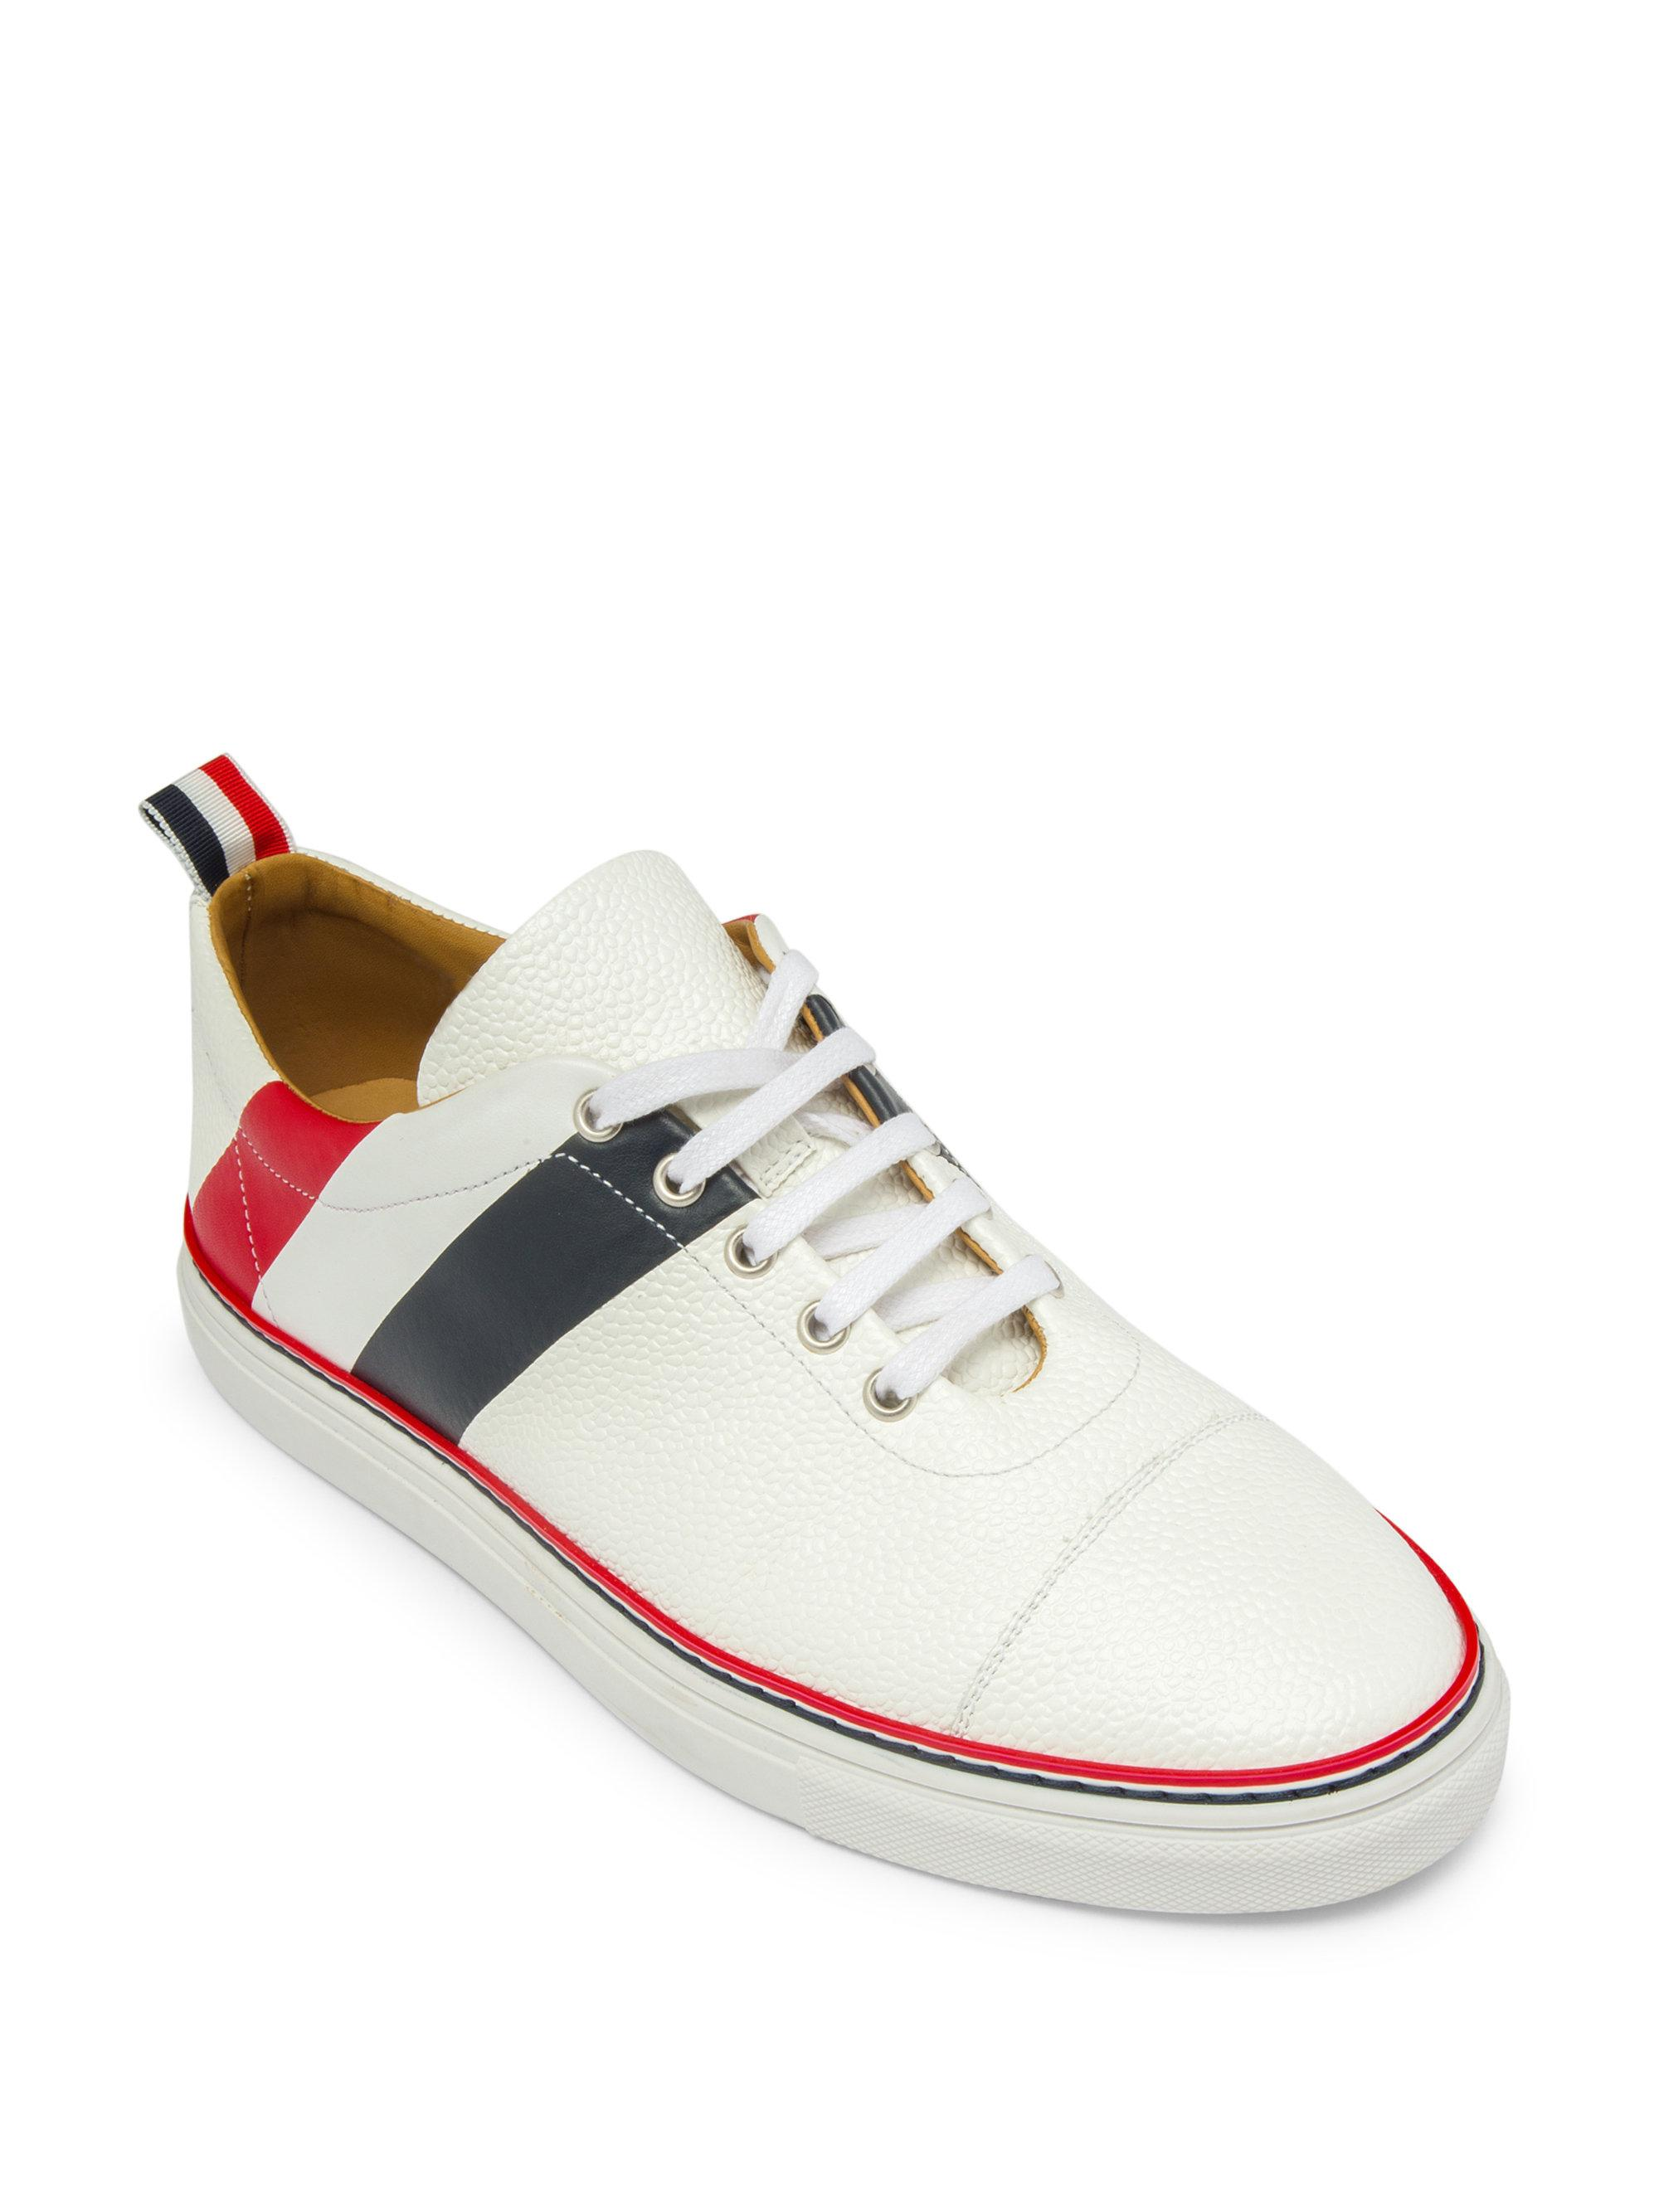 Thom BrowneDiagonal Stripe Canvas & Leather Low-Top Sneakers lJZHIo